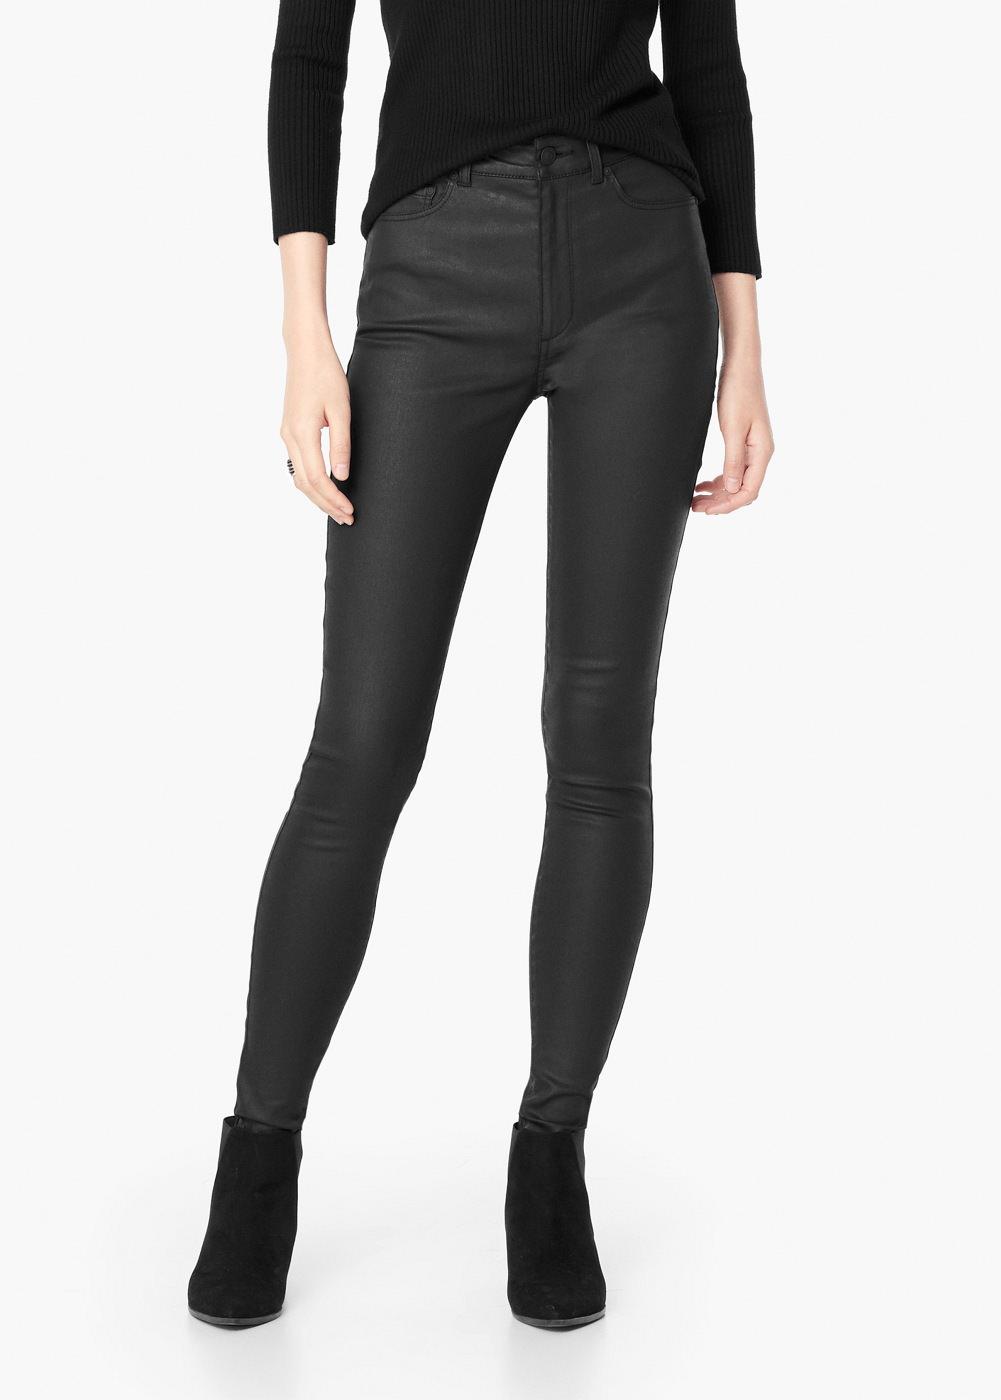 4 Best mid rise black wax coated skinny jeans - Slant